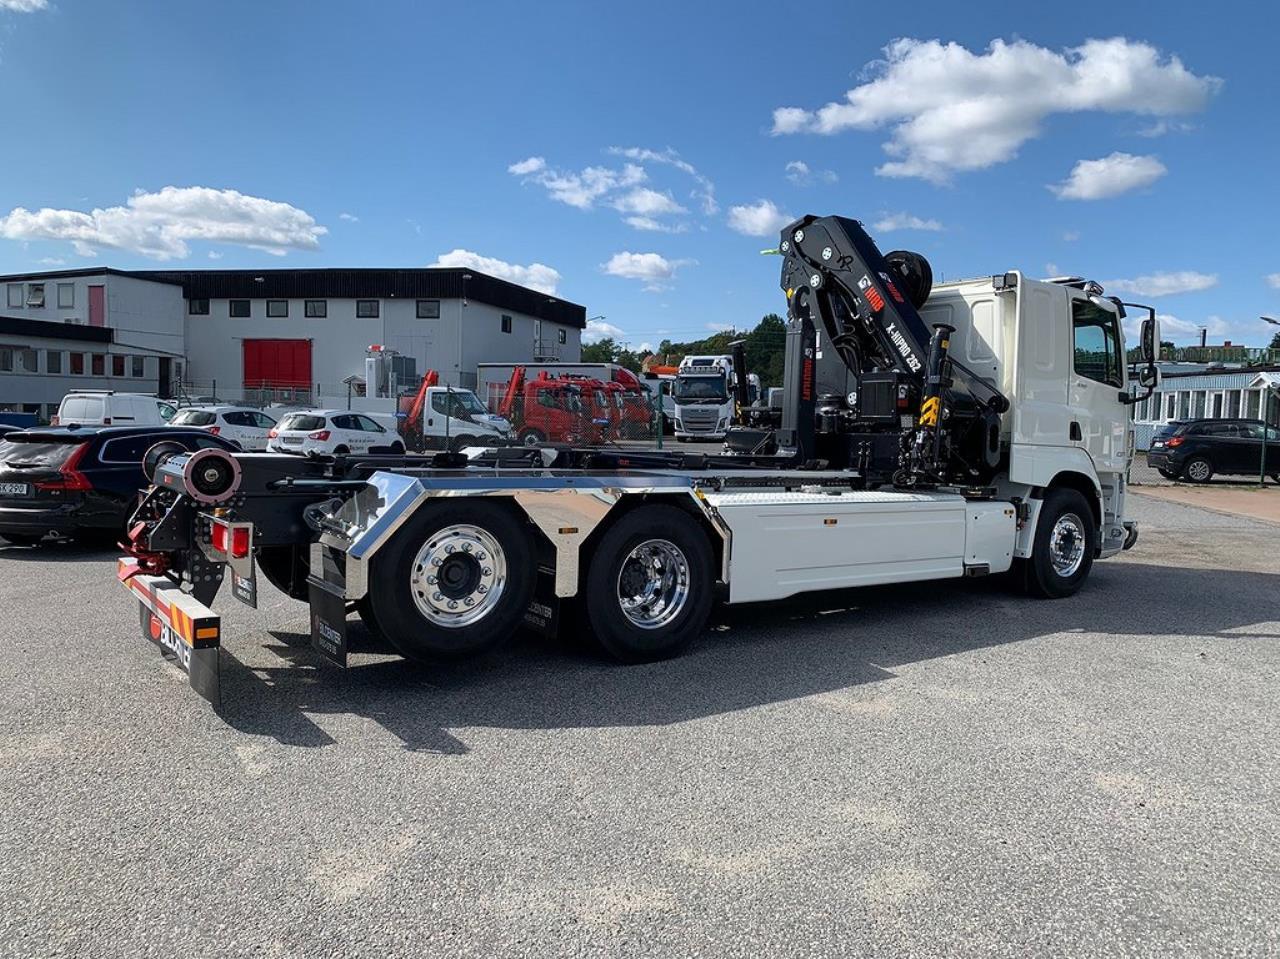 DAF CF 530 6x2*4 Kranväxlare Full Utrustad 2021 - Kran